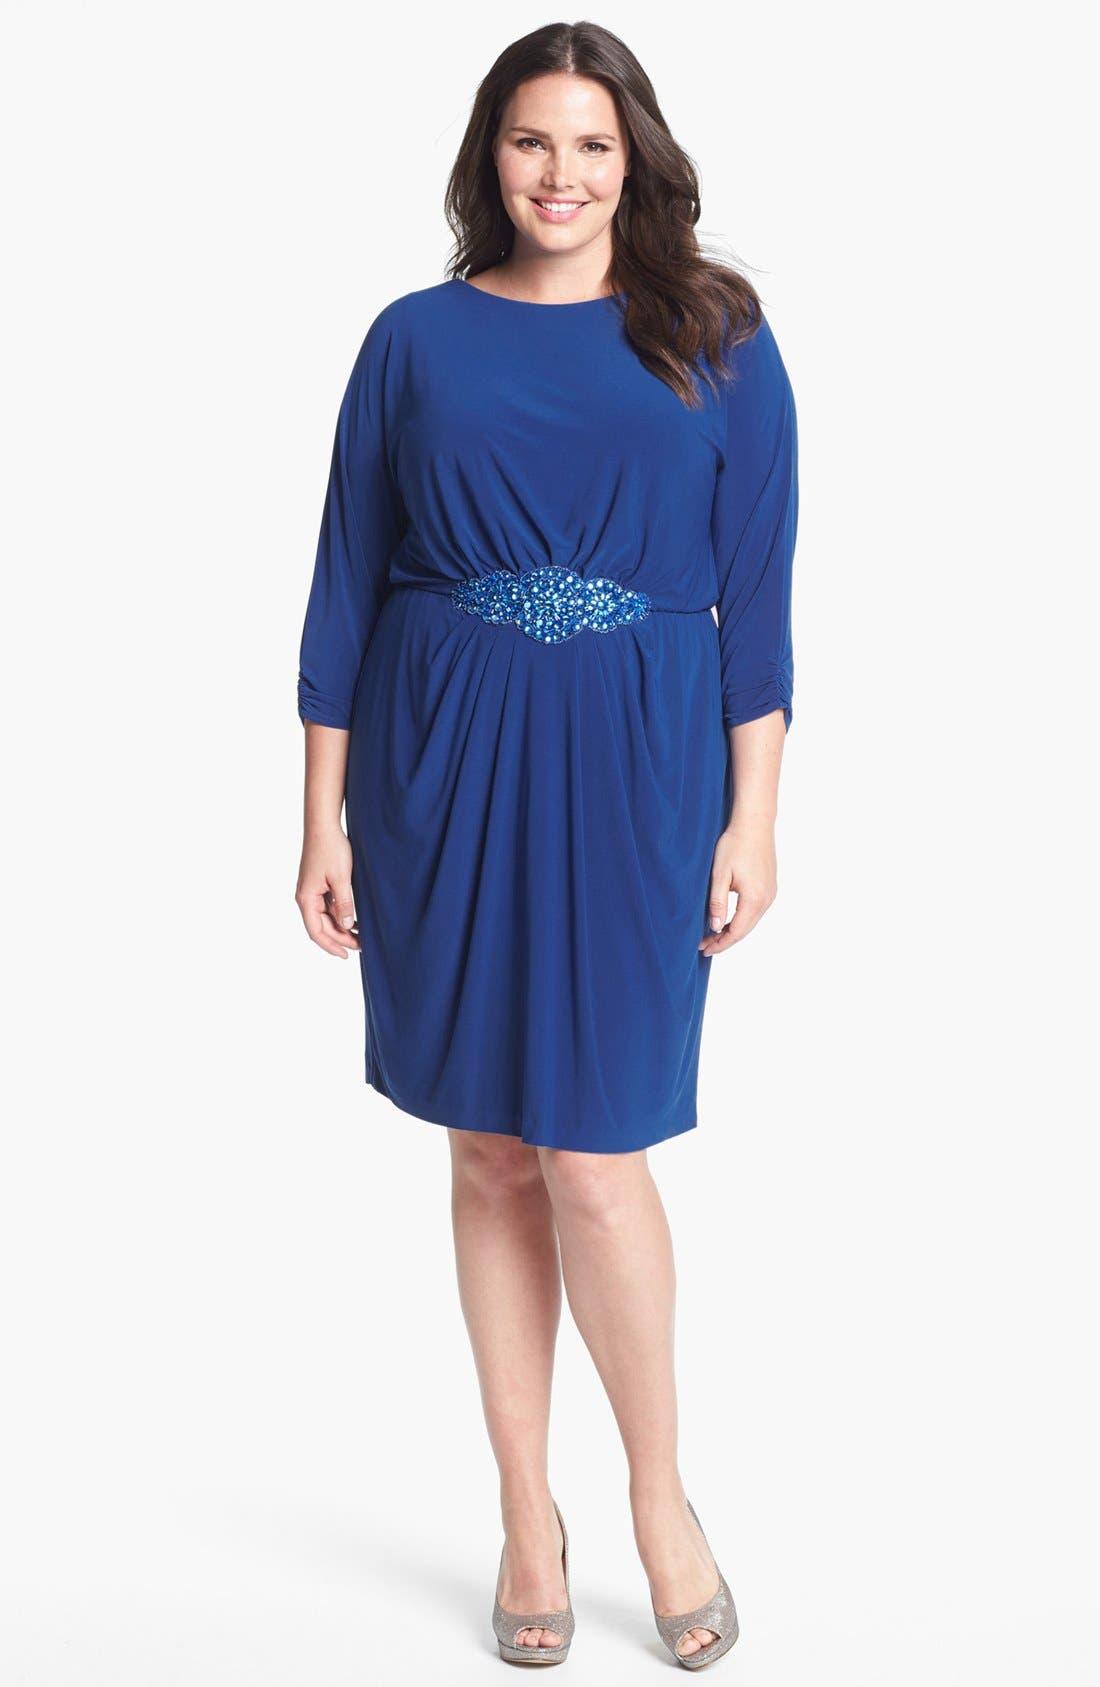 Alternate Image 1 Selected - Alex Evenings Beaded Waist Jersey Blouson Dress (Plus Size)